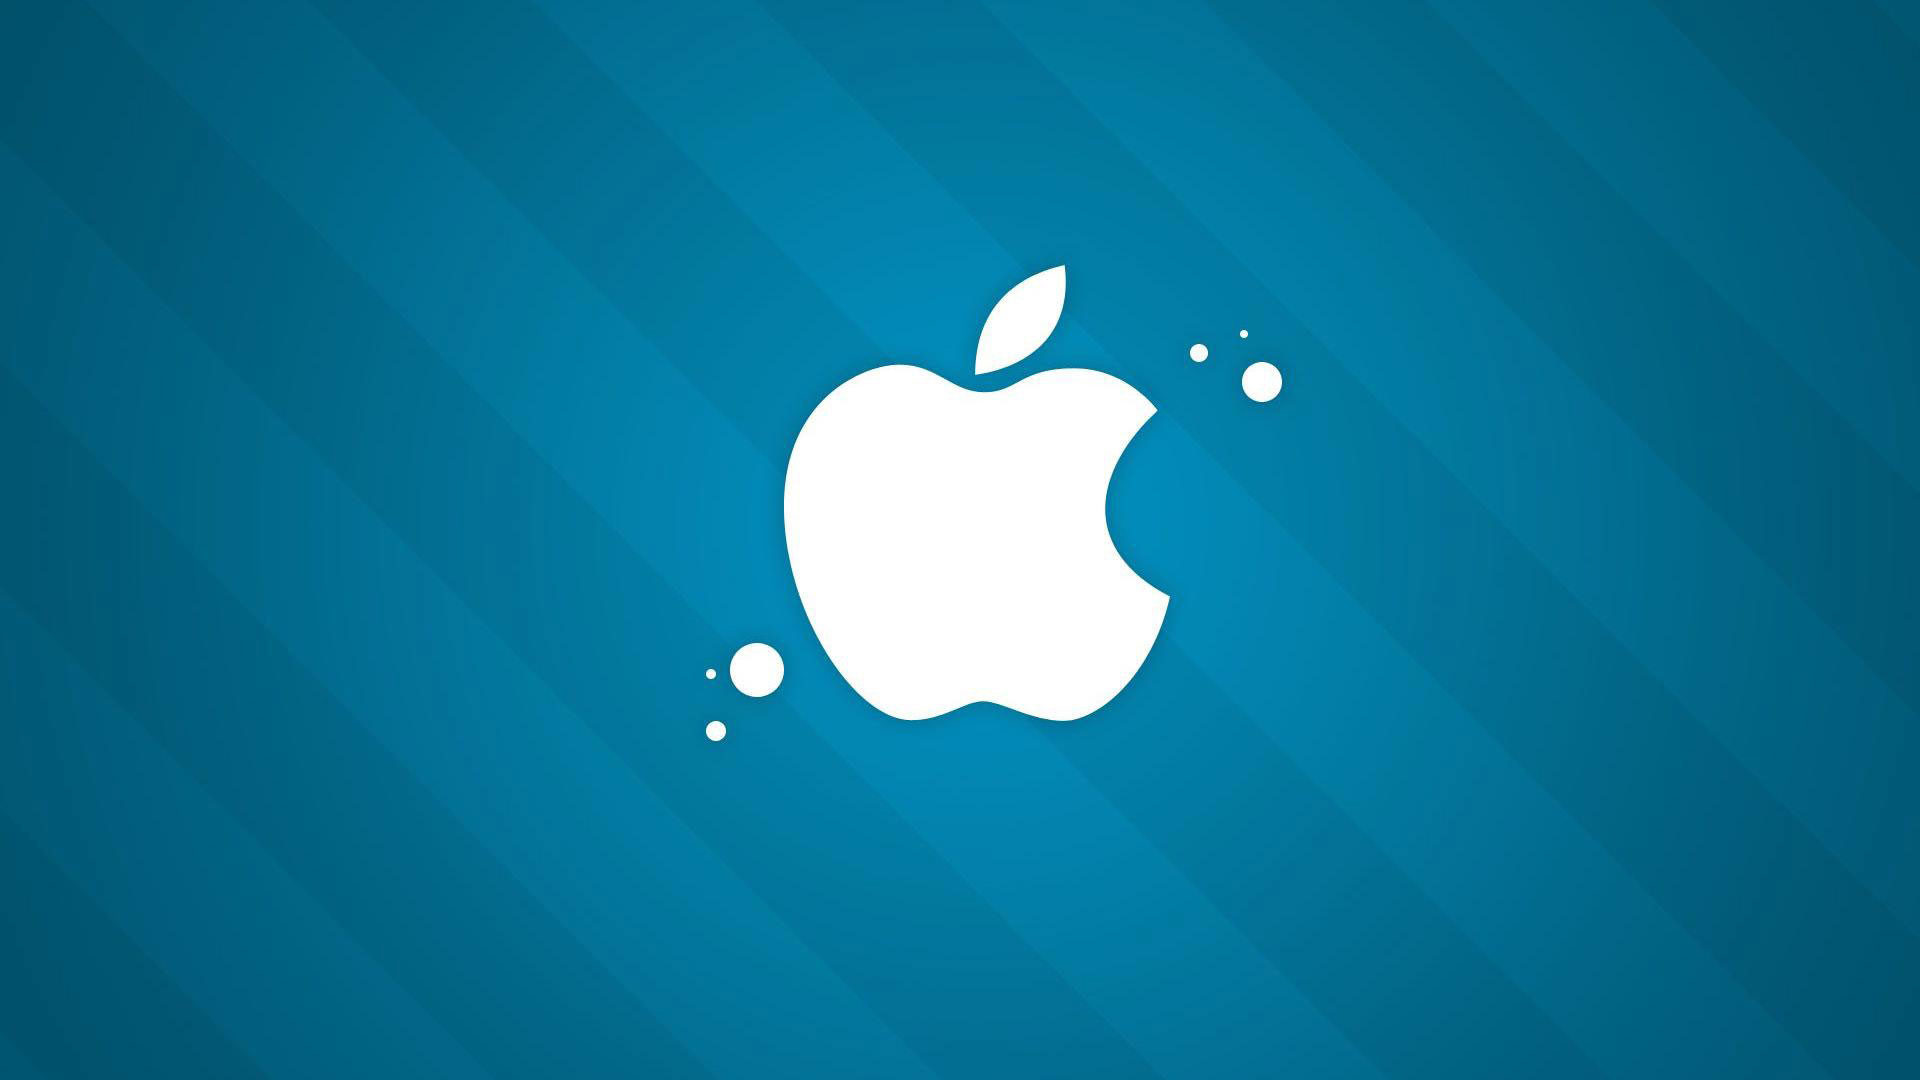 hd pics photos cool blue white apple logo hd quality desktop background  wallpaper